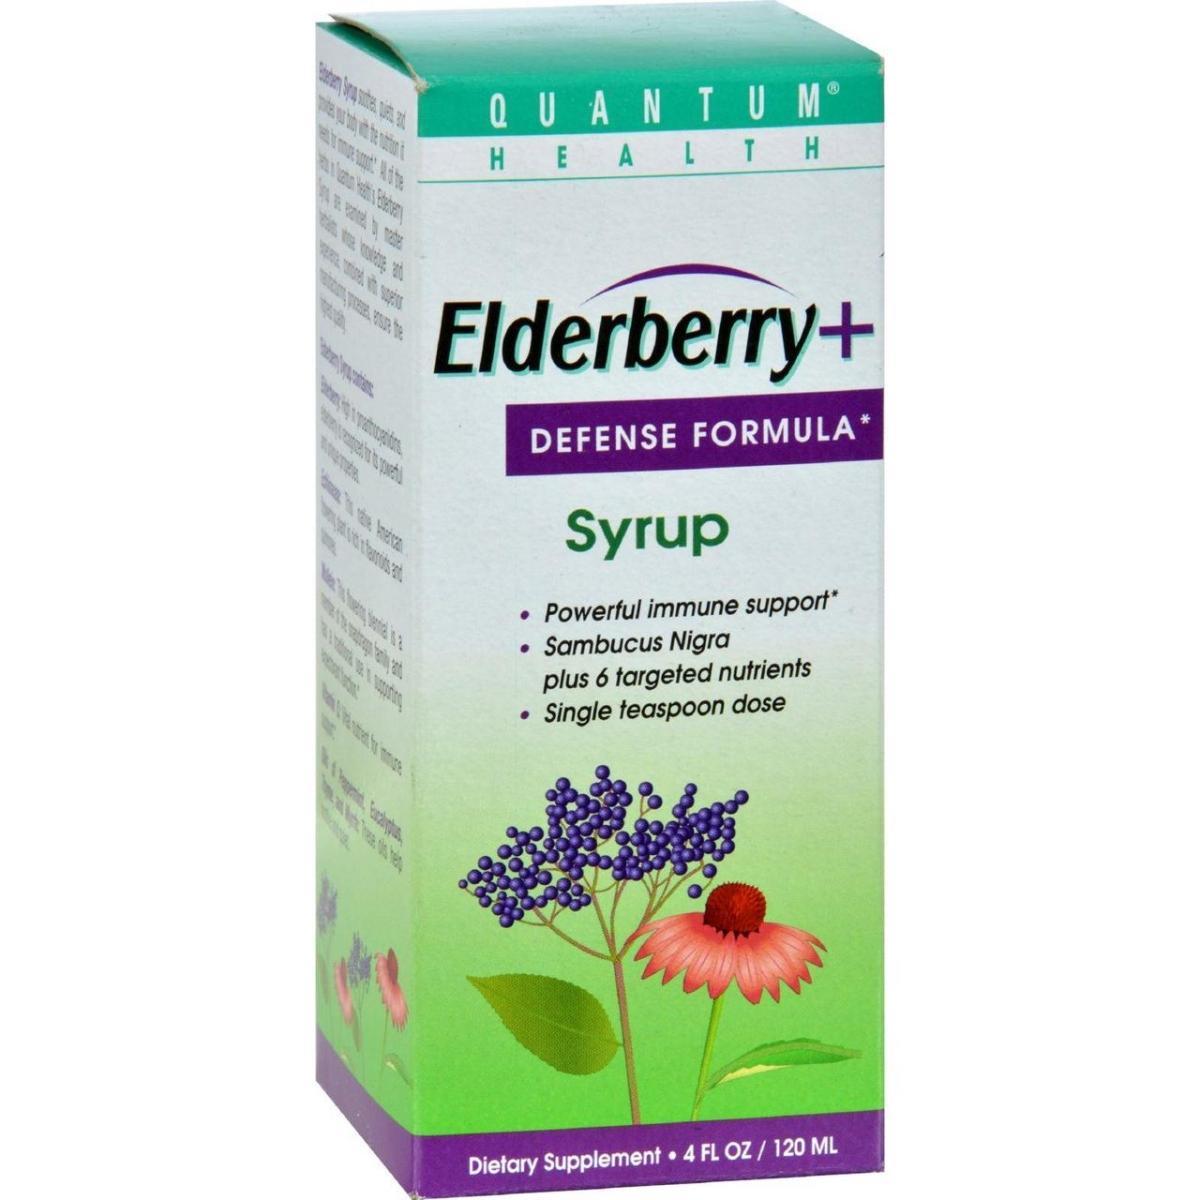 Quantum Research HG0518845 4 fl oz Elderberry Syrup